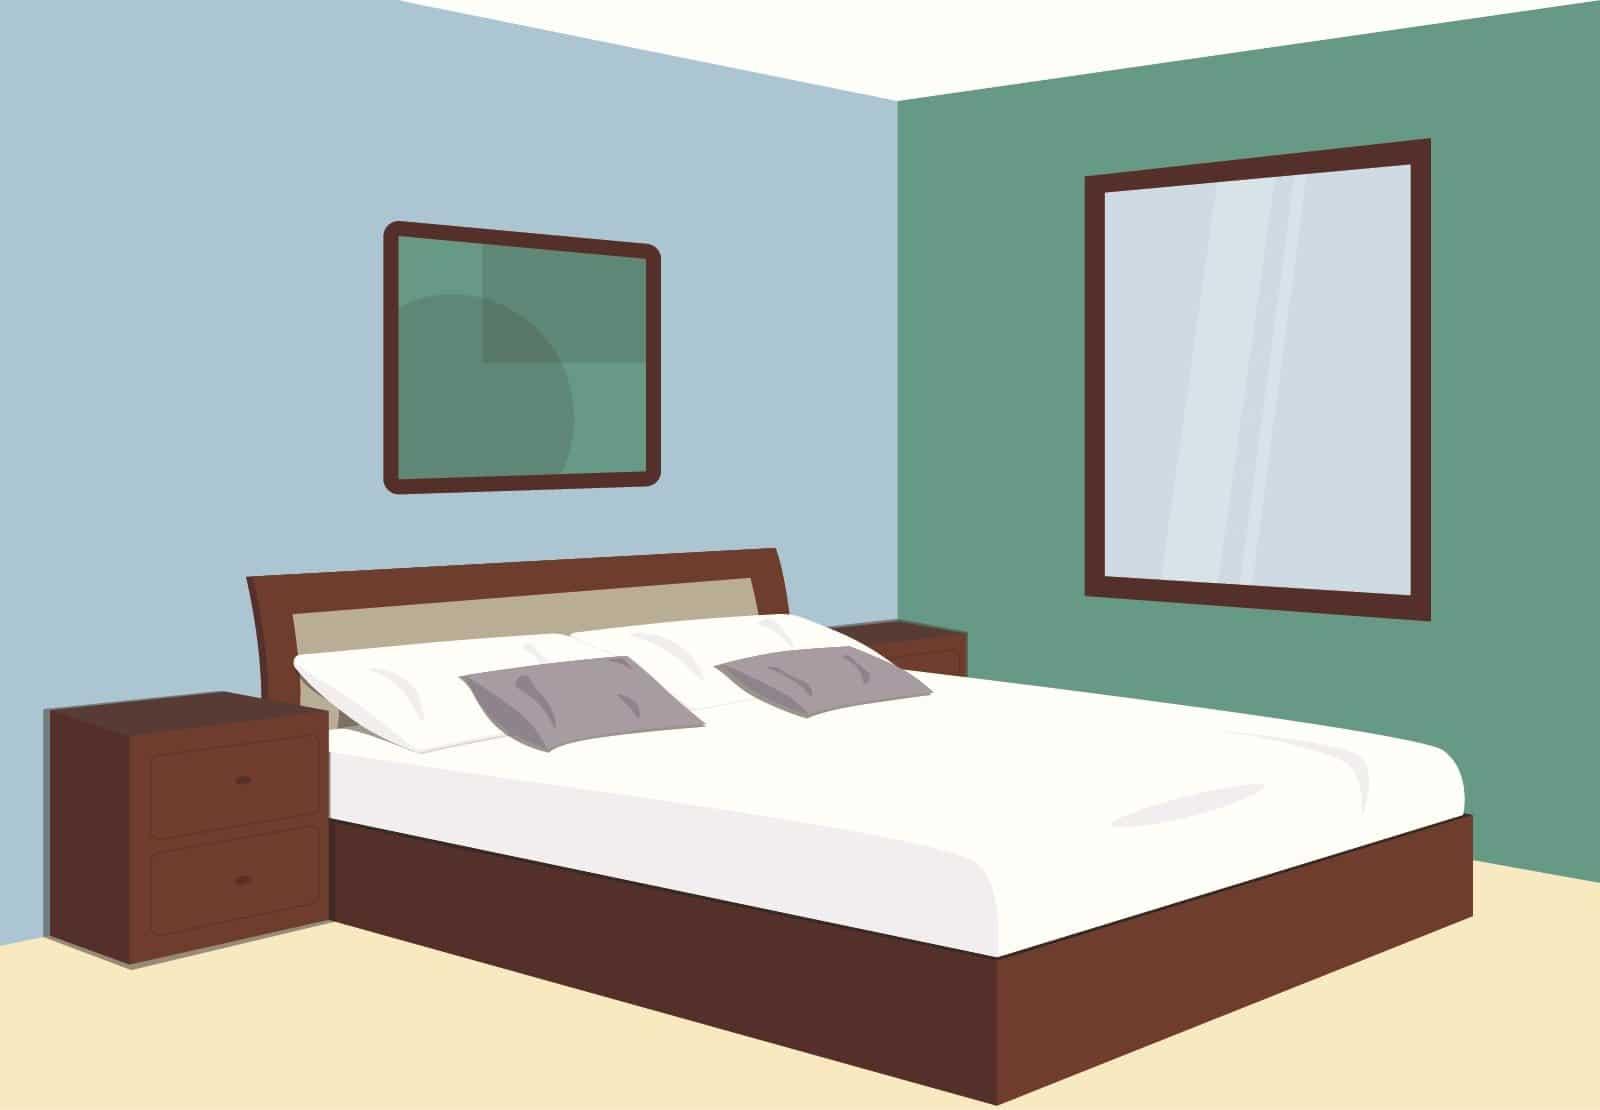 Beruhigende Farben Furs Schlafzimmer - Caseconrad.com